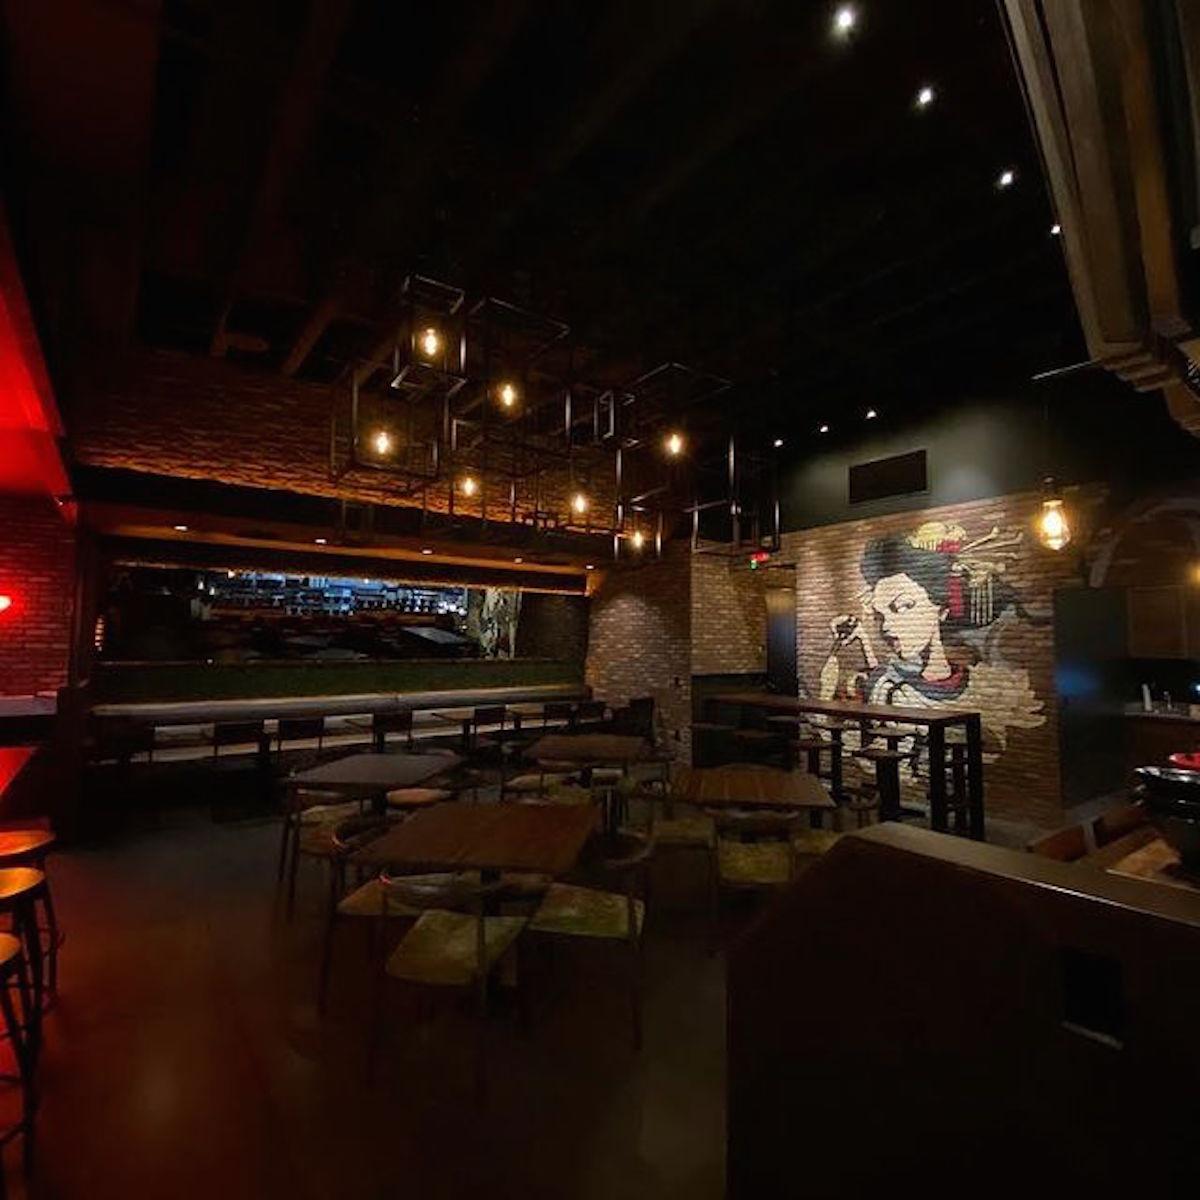 JINYA Ramen to Open in Chandler April 29th